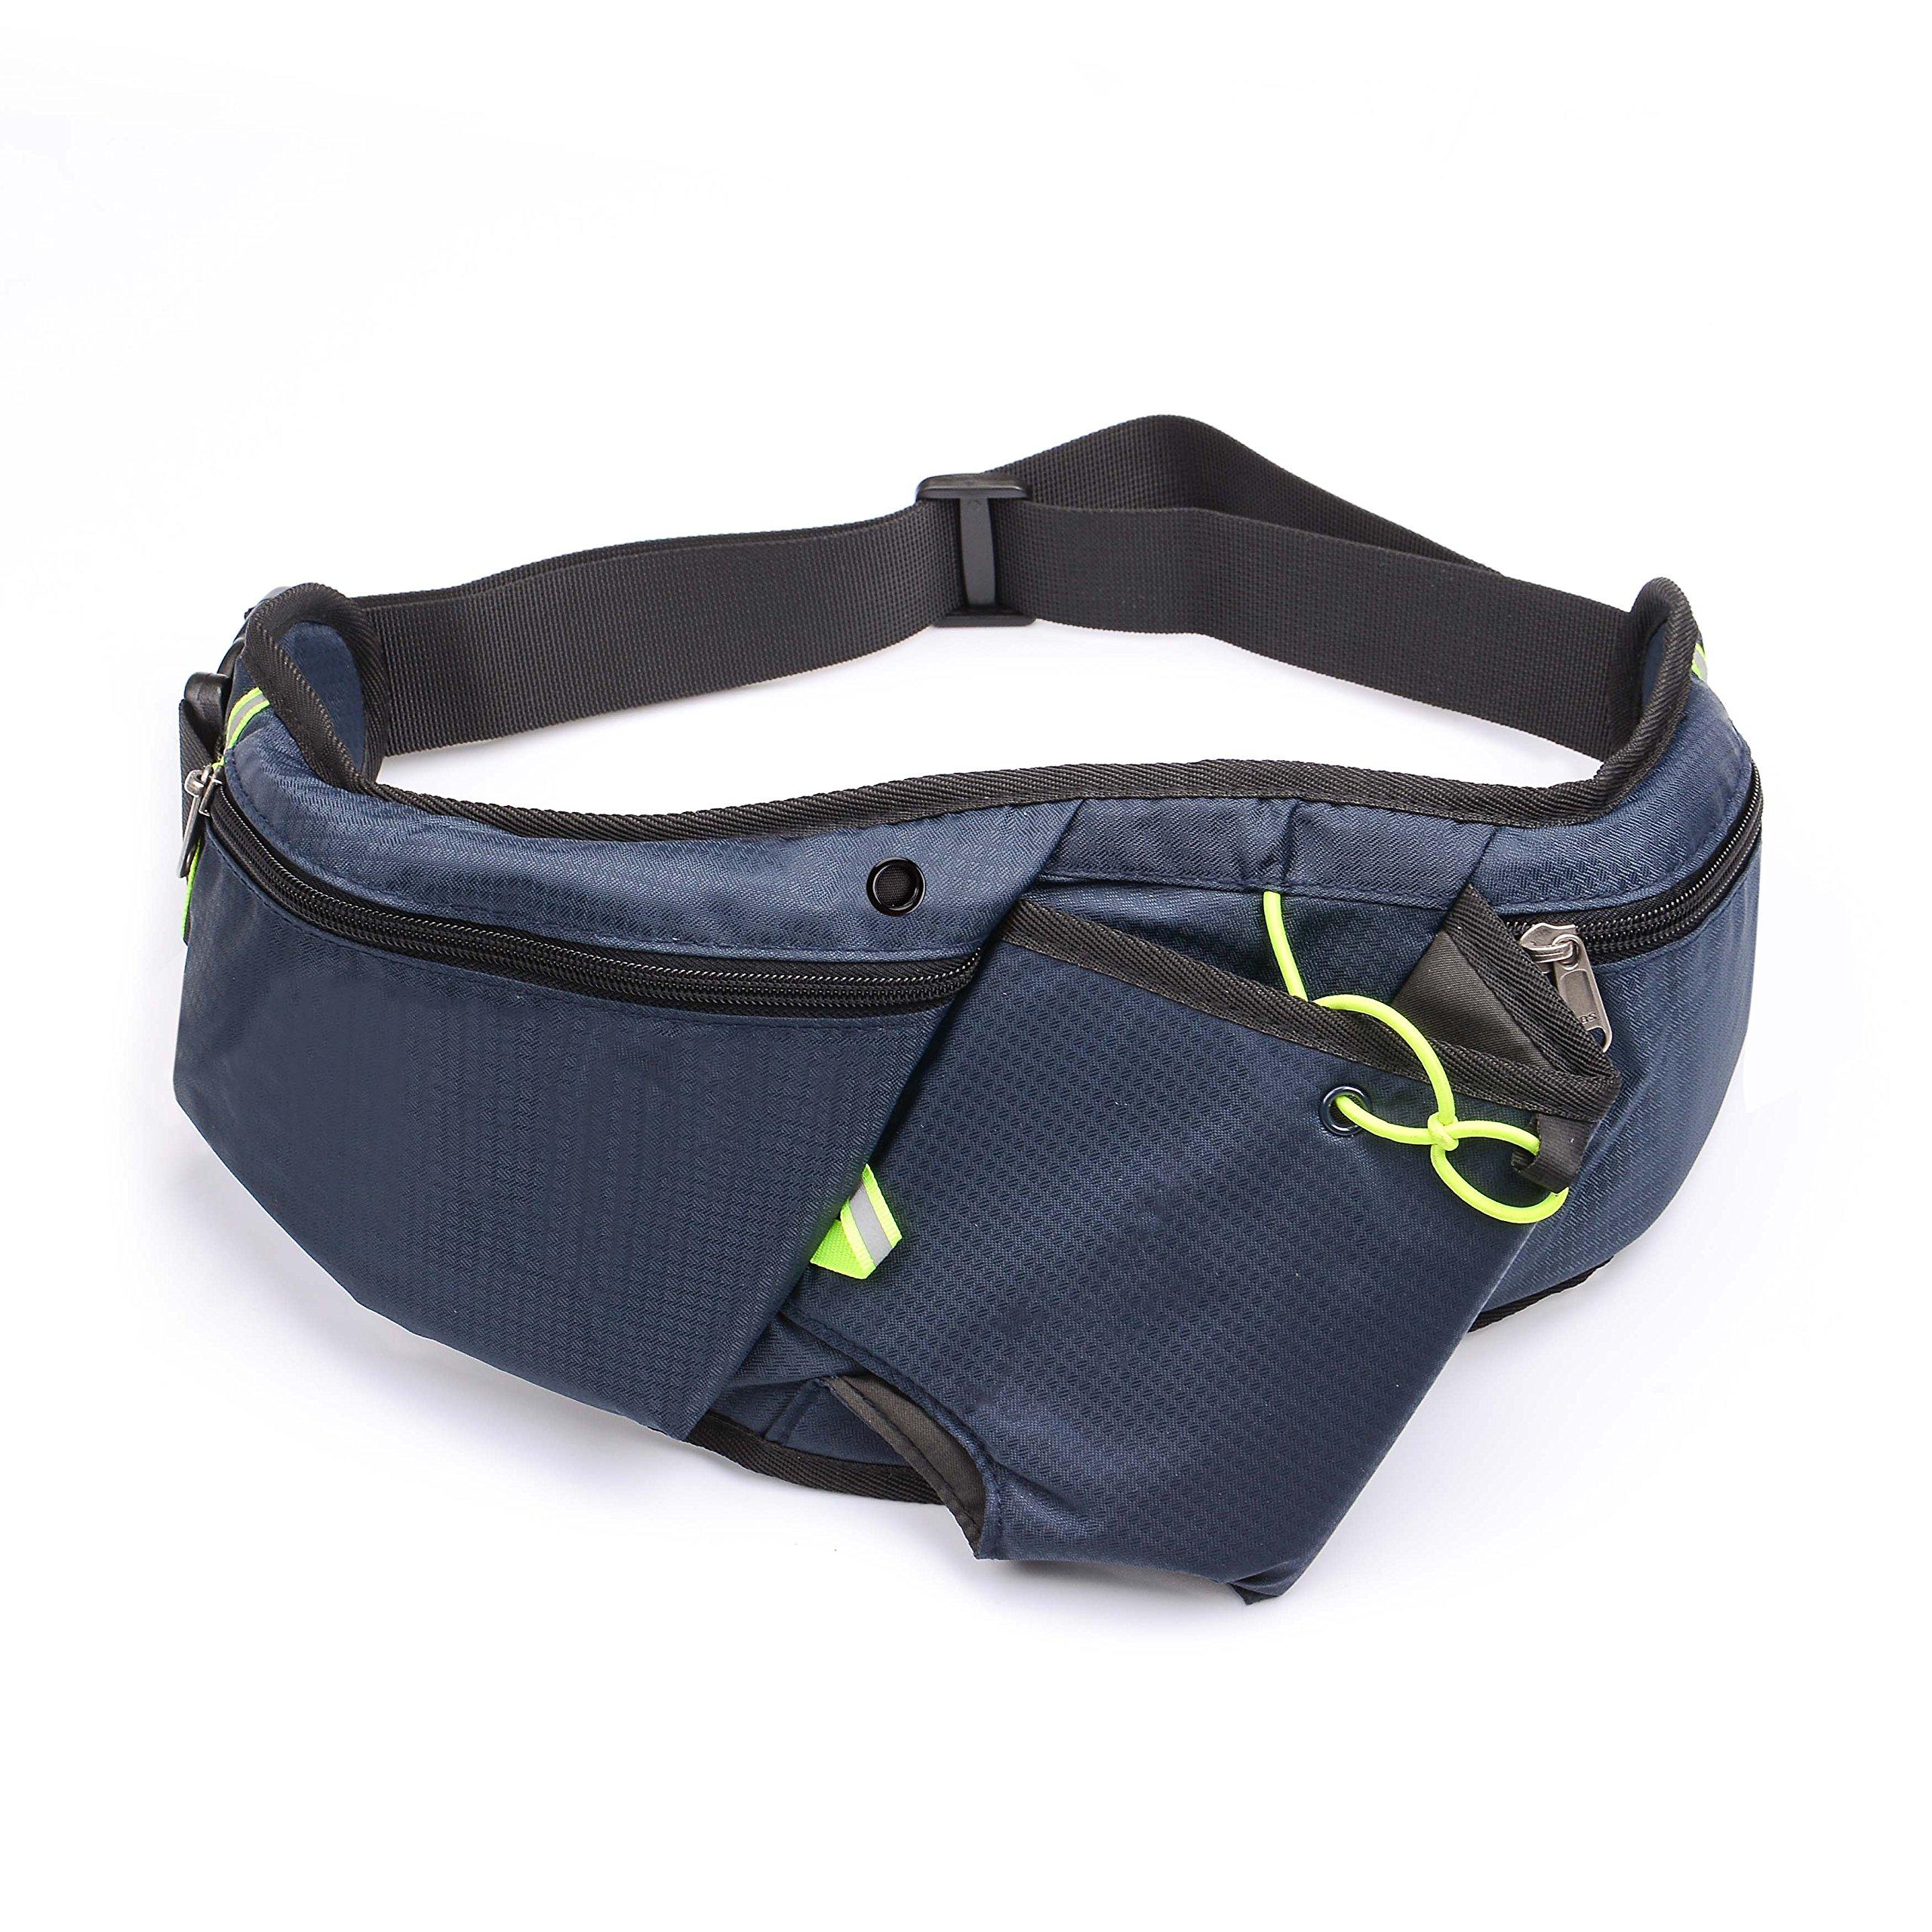 U-TIMES Fanny Bag for Women & Men Running Belt Pouch Gym Waist Pack - with Water Bottle Holder/Headphone Jack Hole/Fluorescent Tape